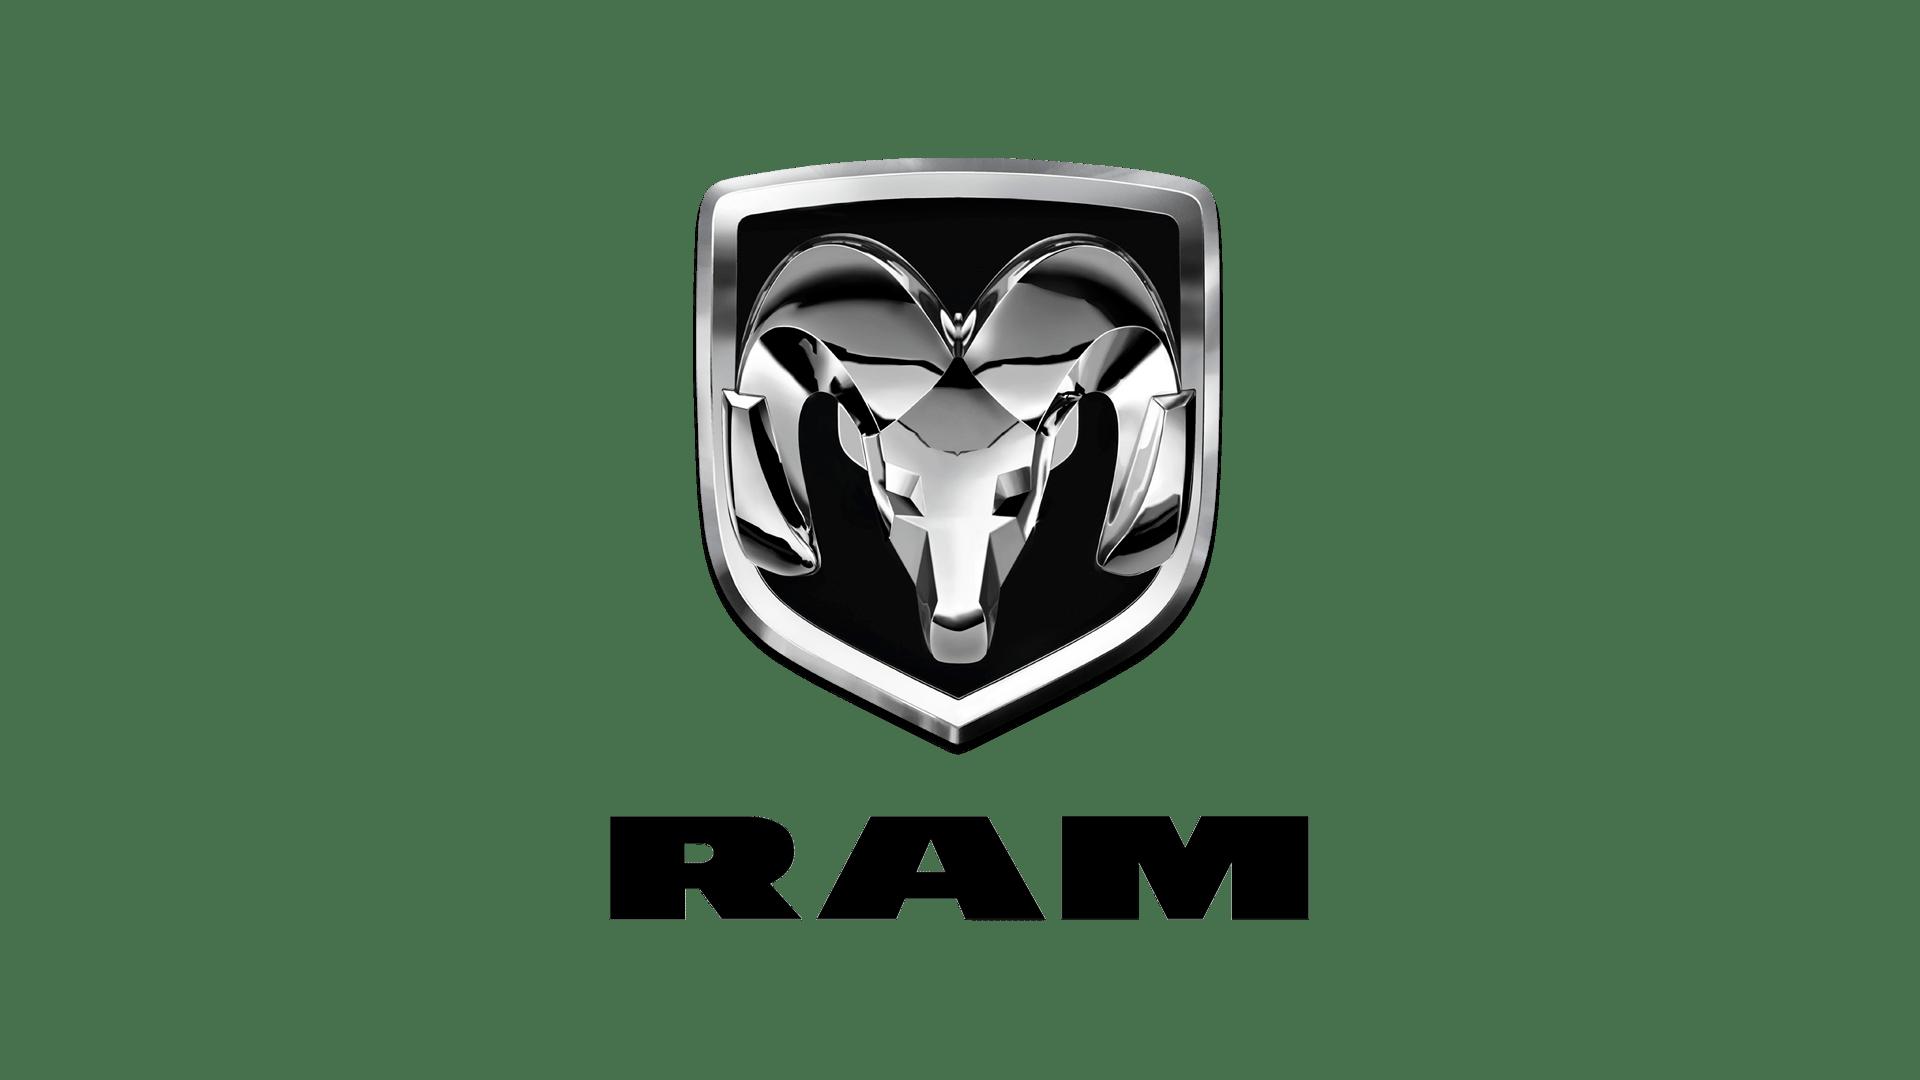 RAM-logo-2009-1920x1080